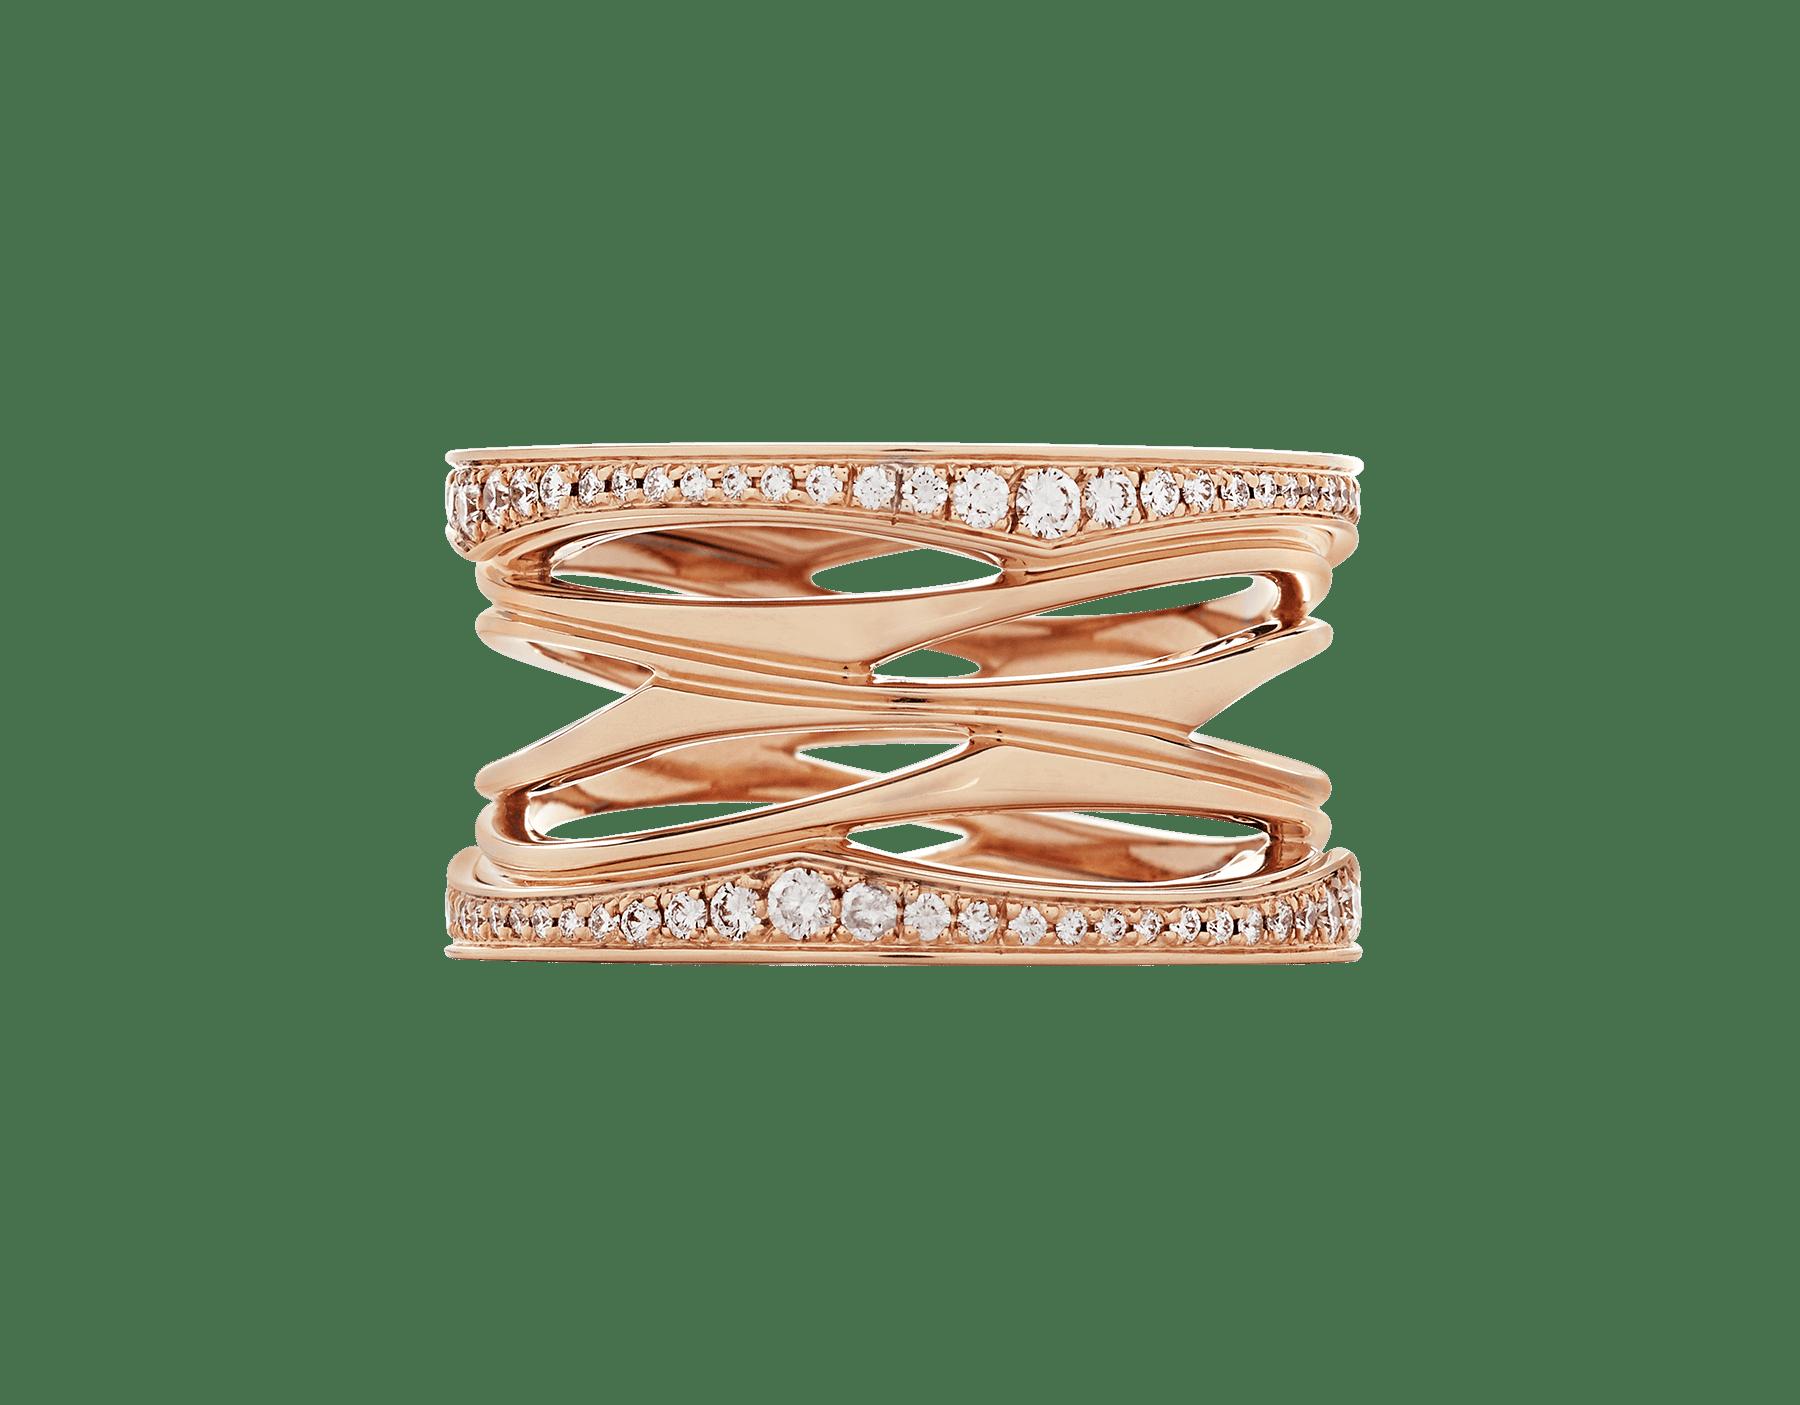 Anillo B.zero1 Design Legend de cuatro bandas en oro rosa de 18 qt con pavé de diamantes (0,61 ct) en los bordes. B-zero1-4-bands-AN858125 image 3